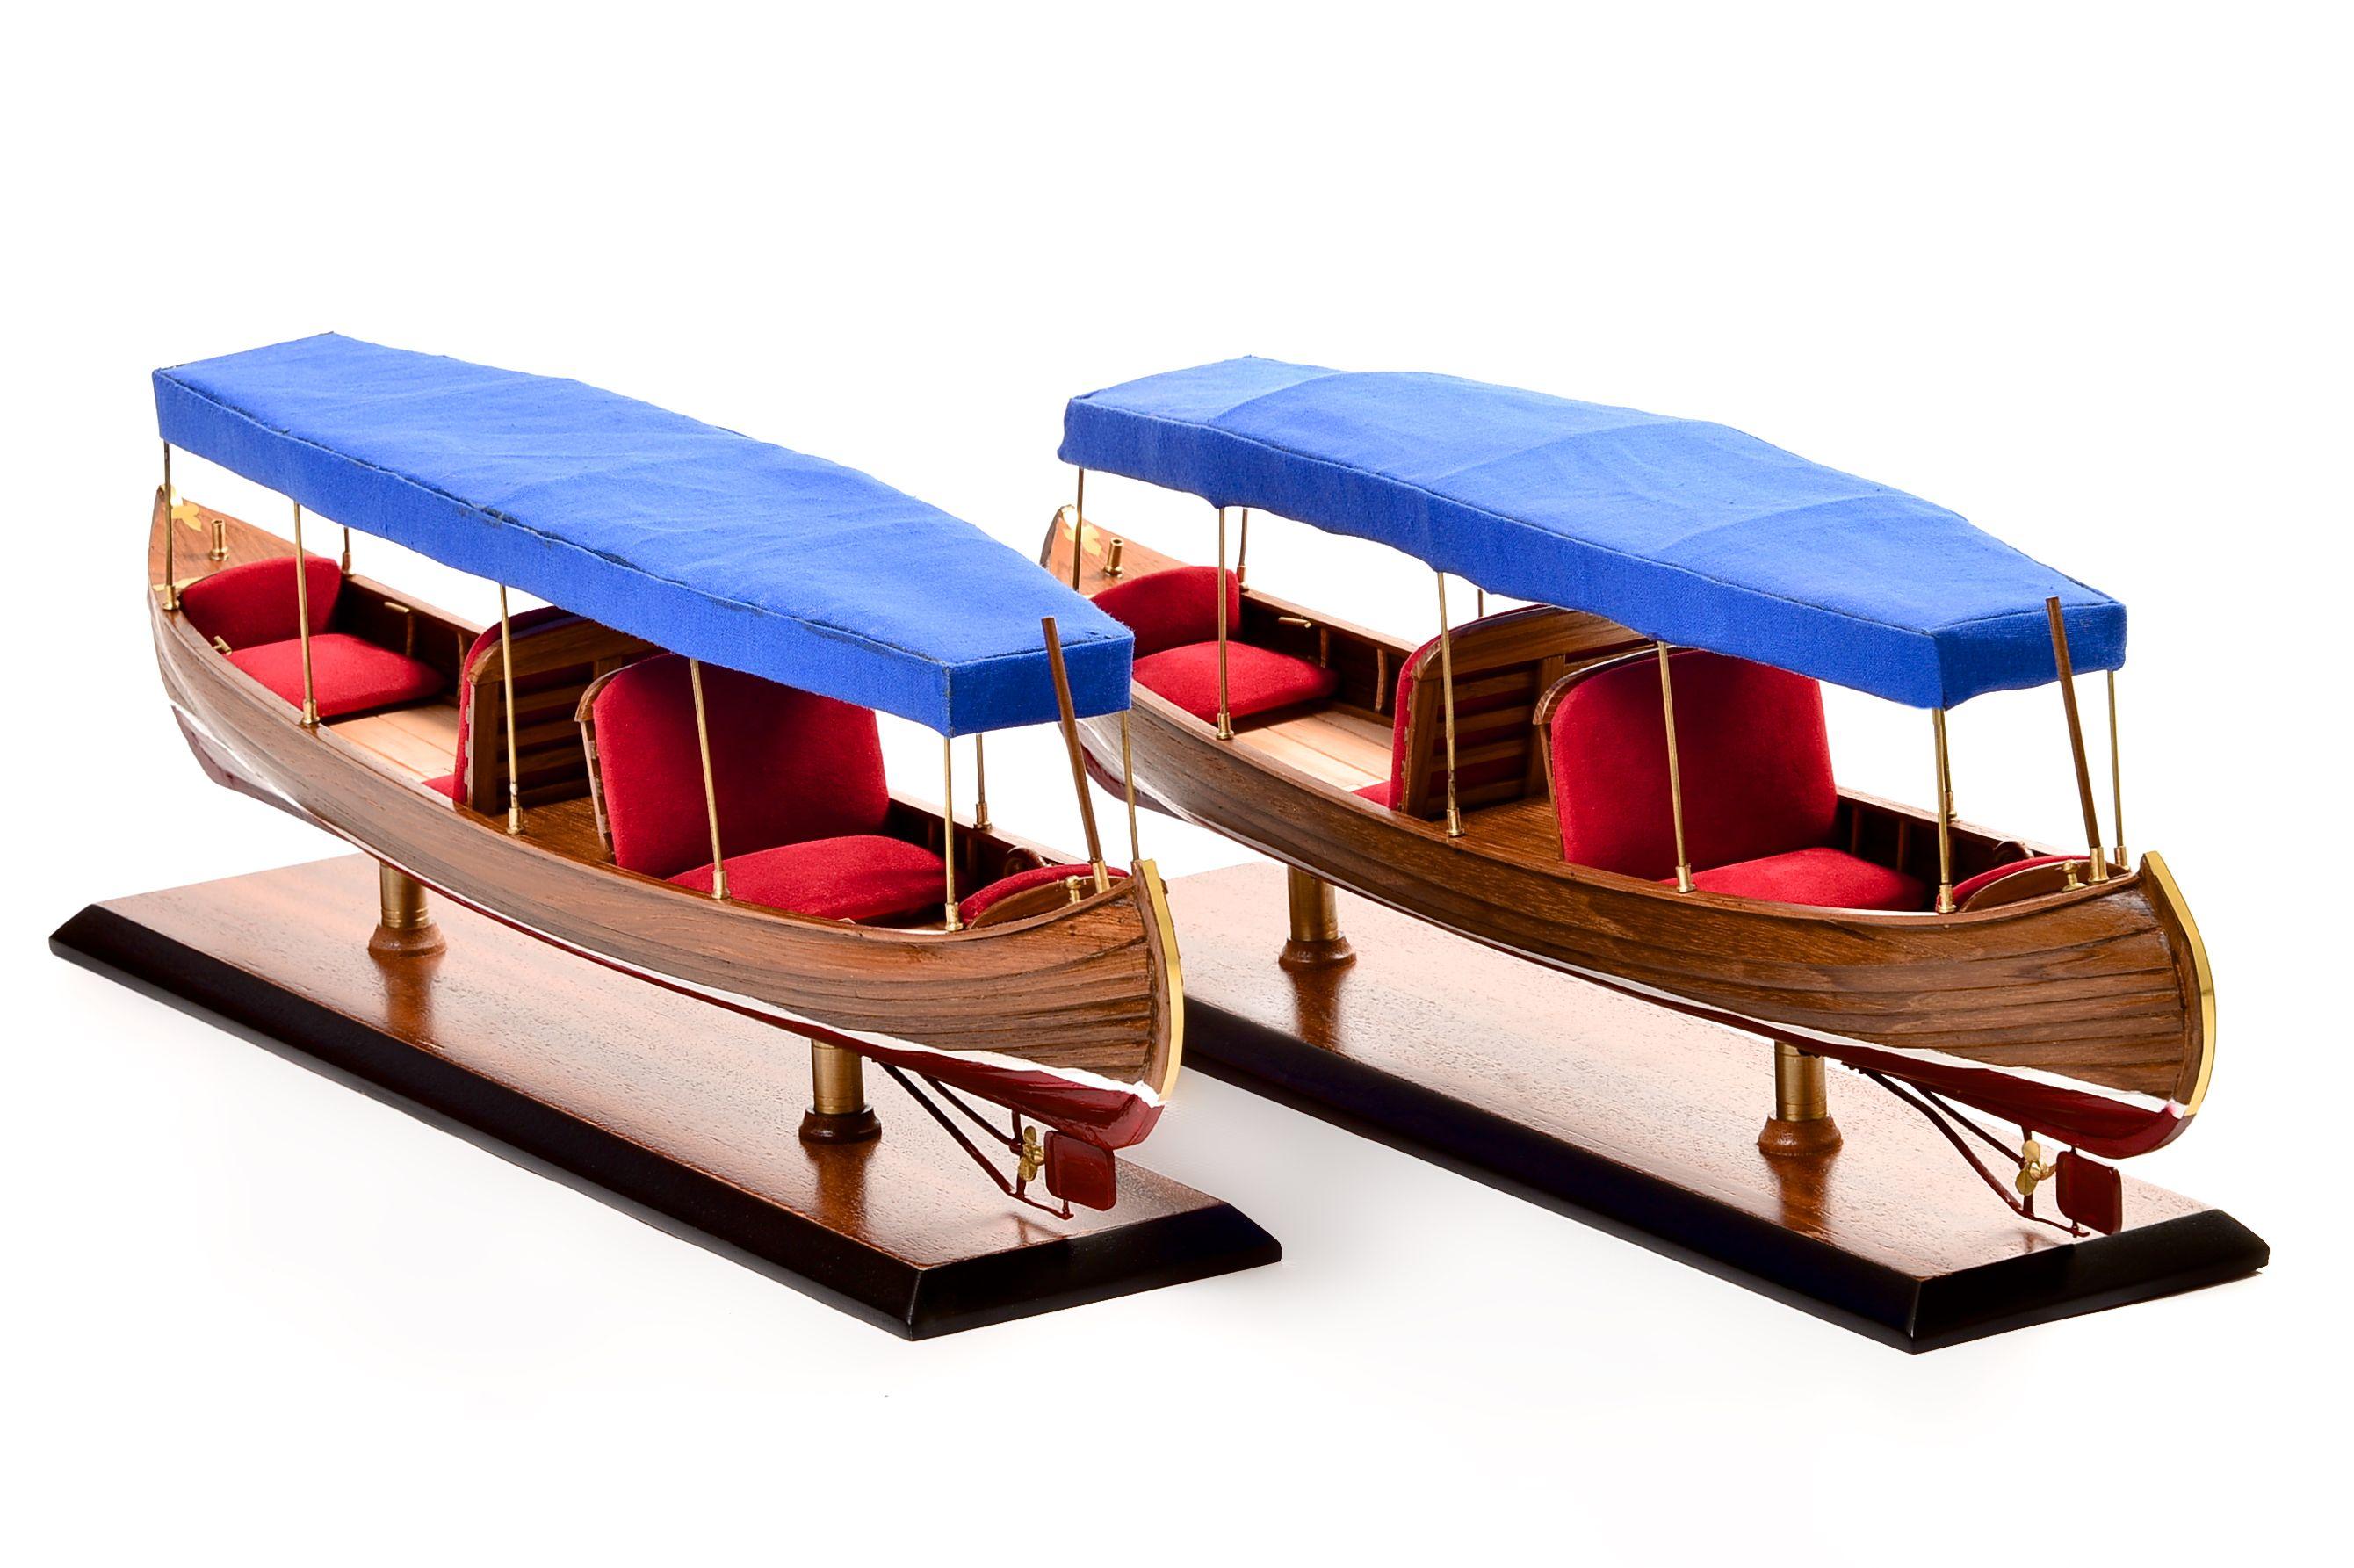 1865-11246-Liddesdale-Electric-Canoe-1920